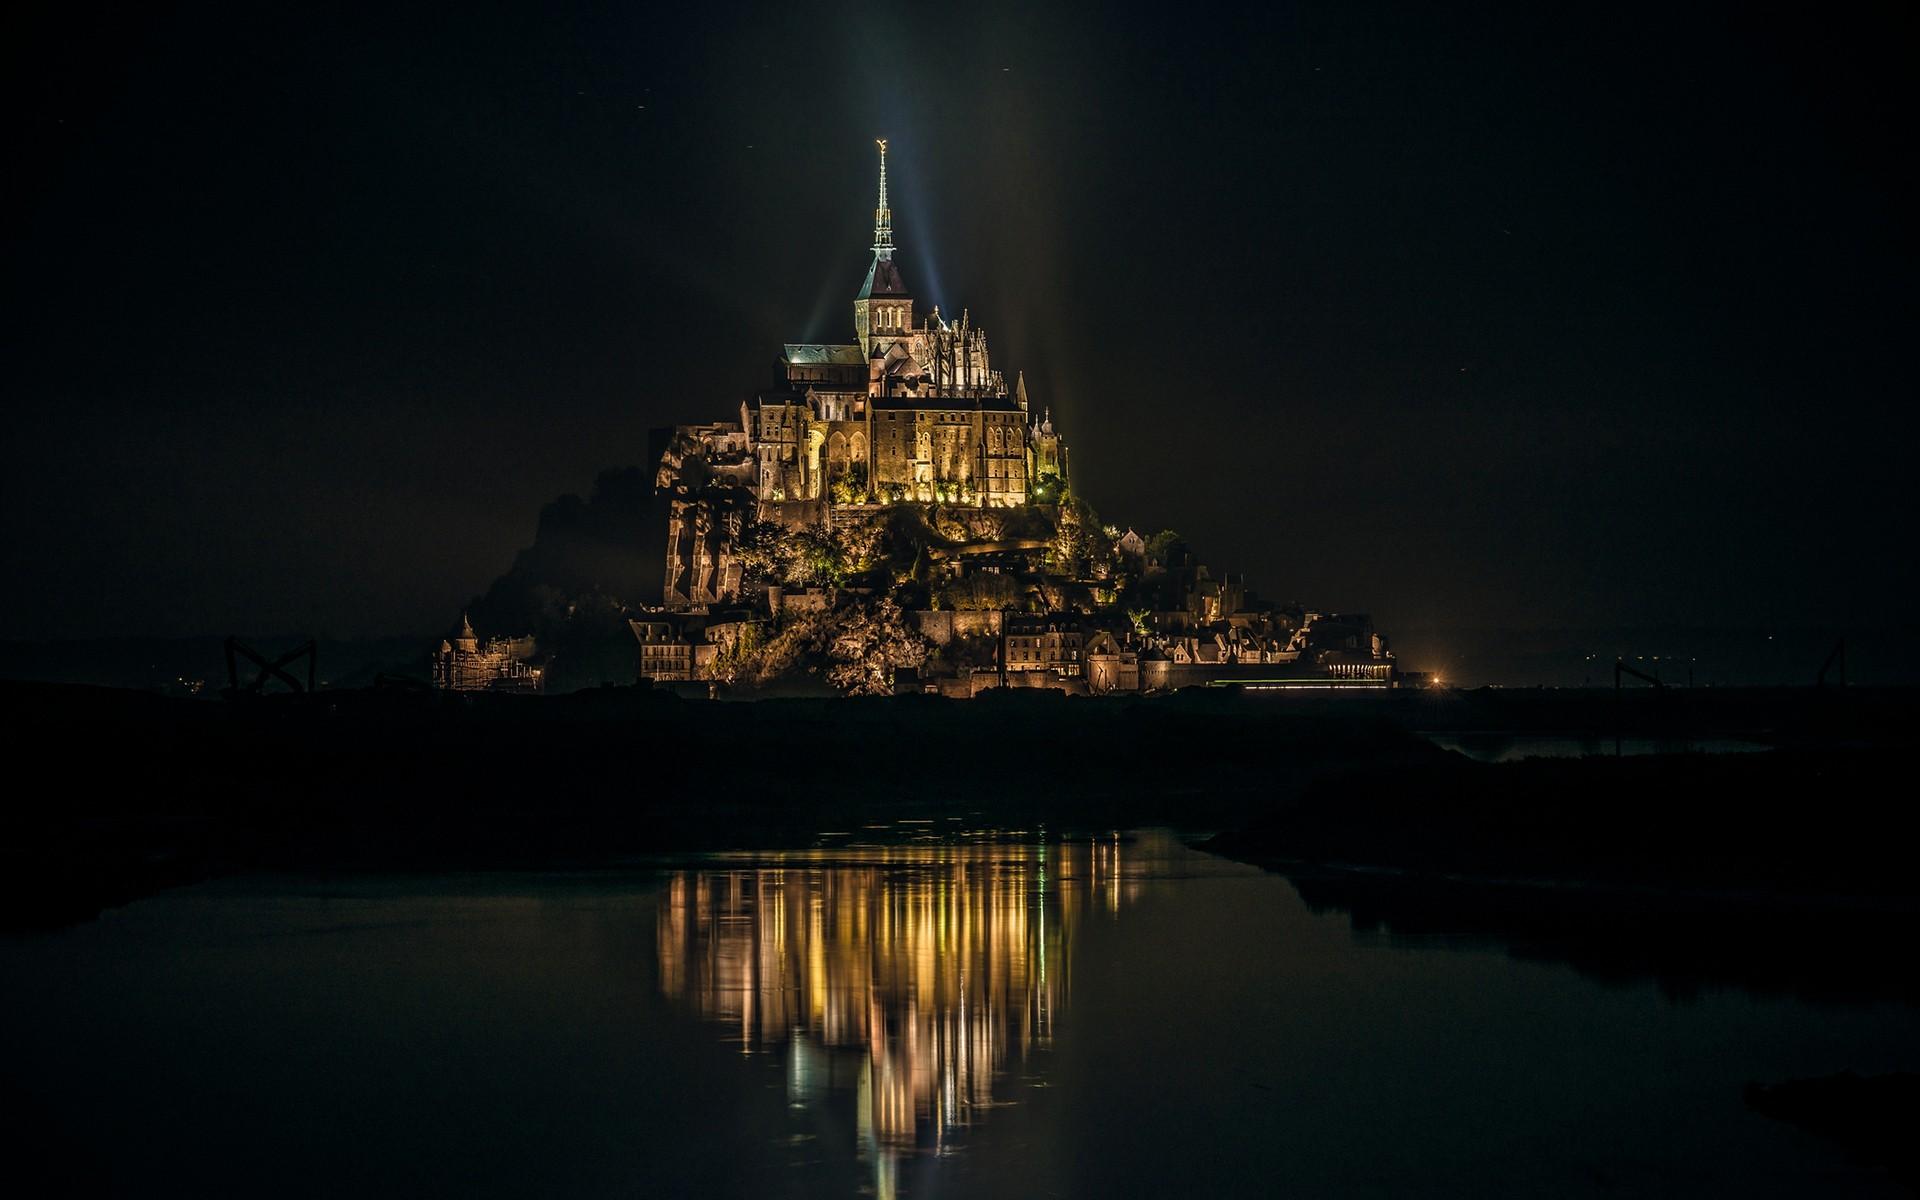 General 1920x1200 Mont Saint-Michel island night France city lights Abbey